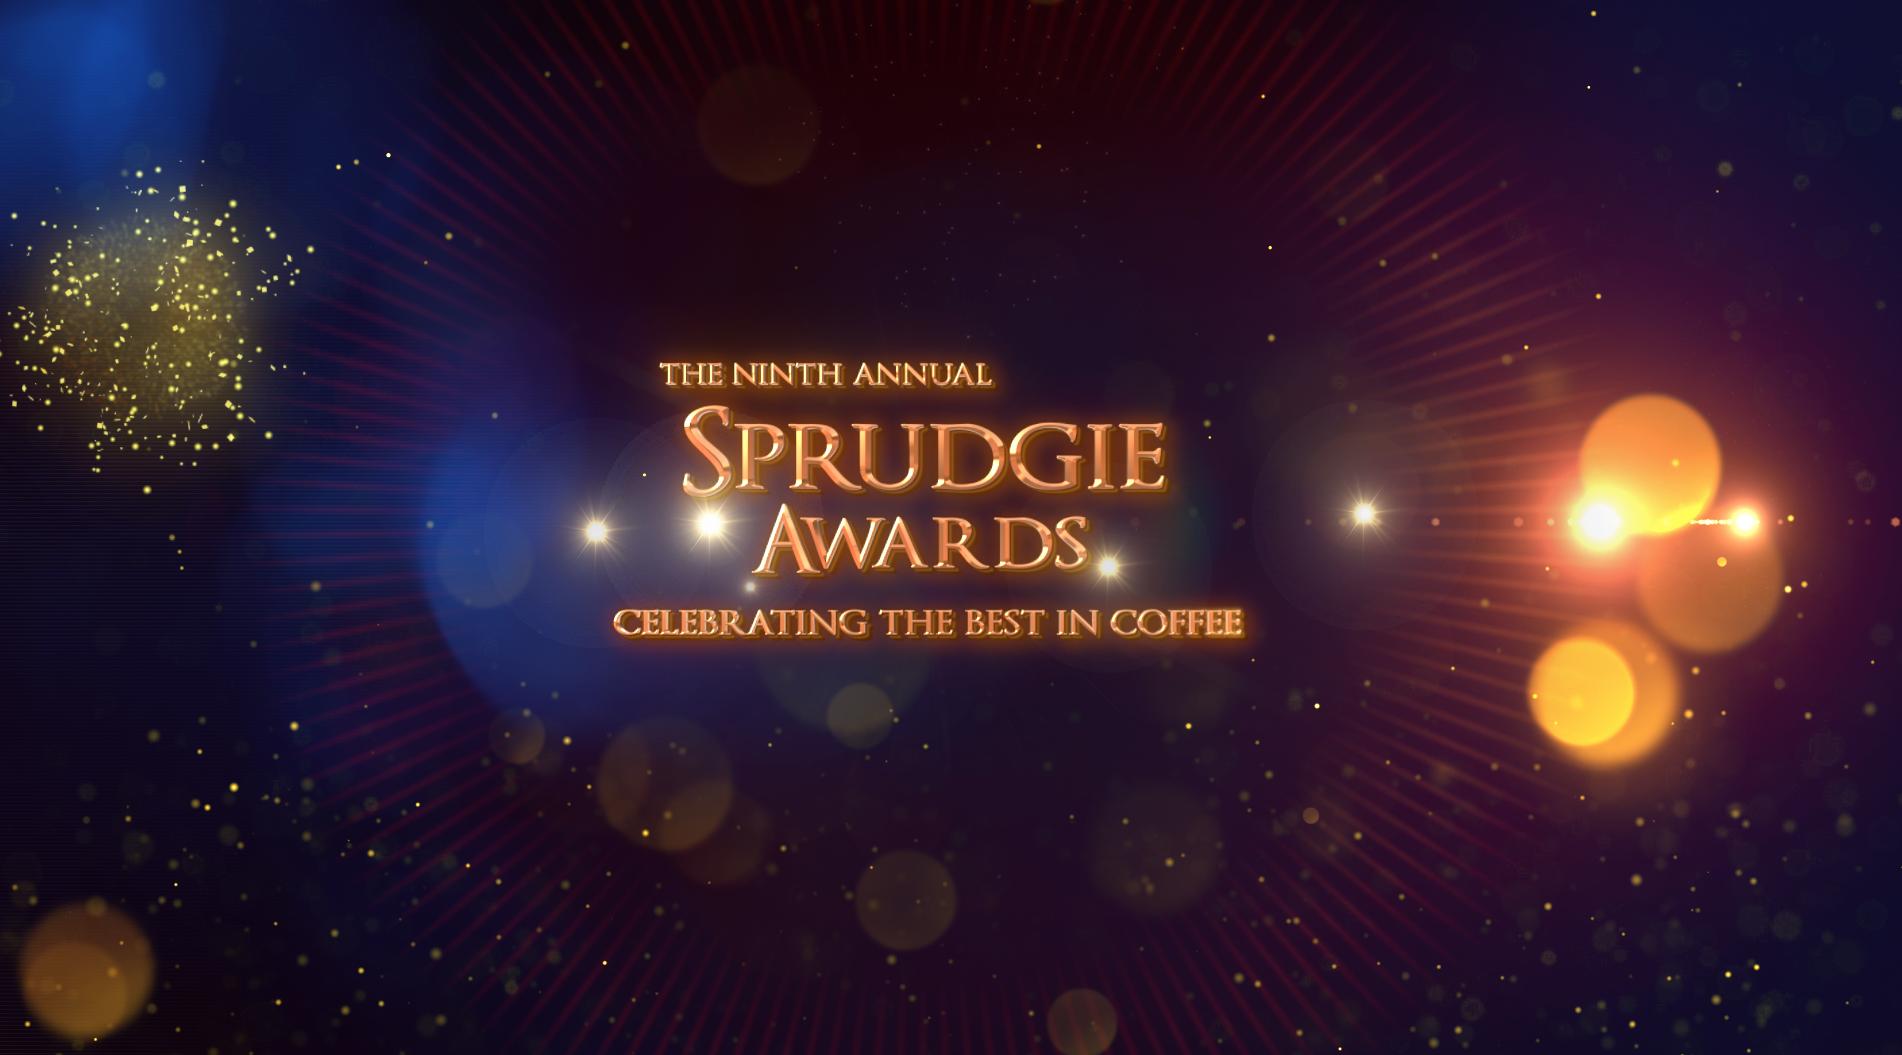 The Ninth Annual Sprudgie Awards photo